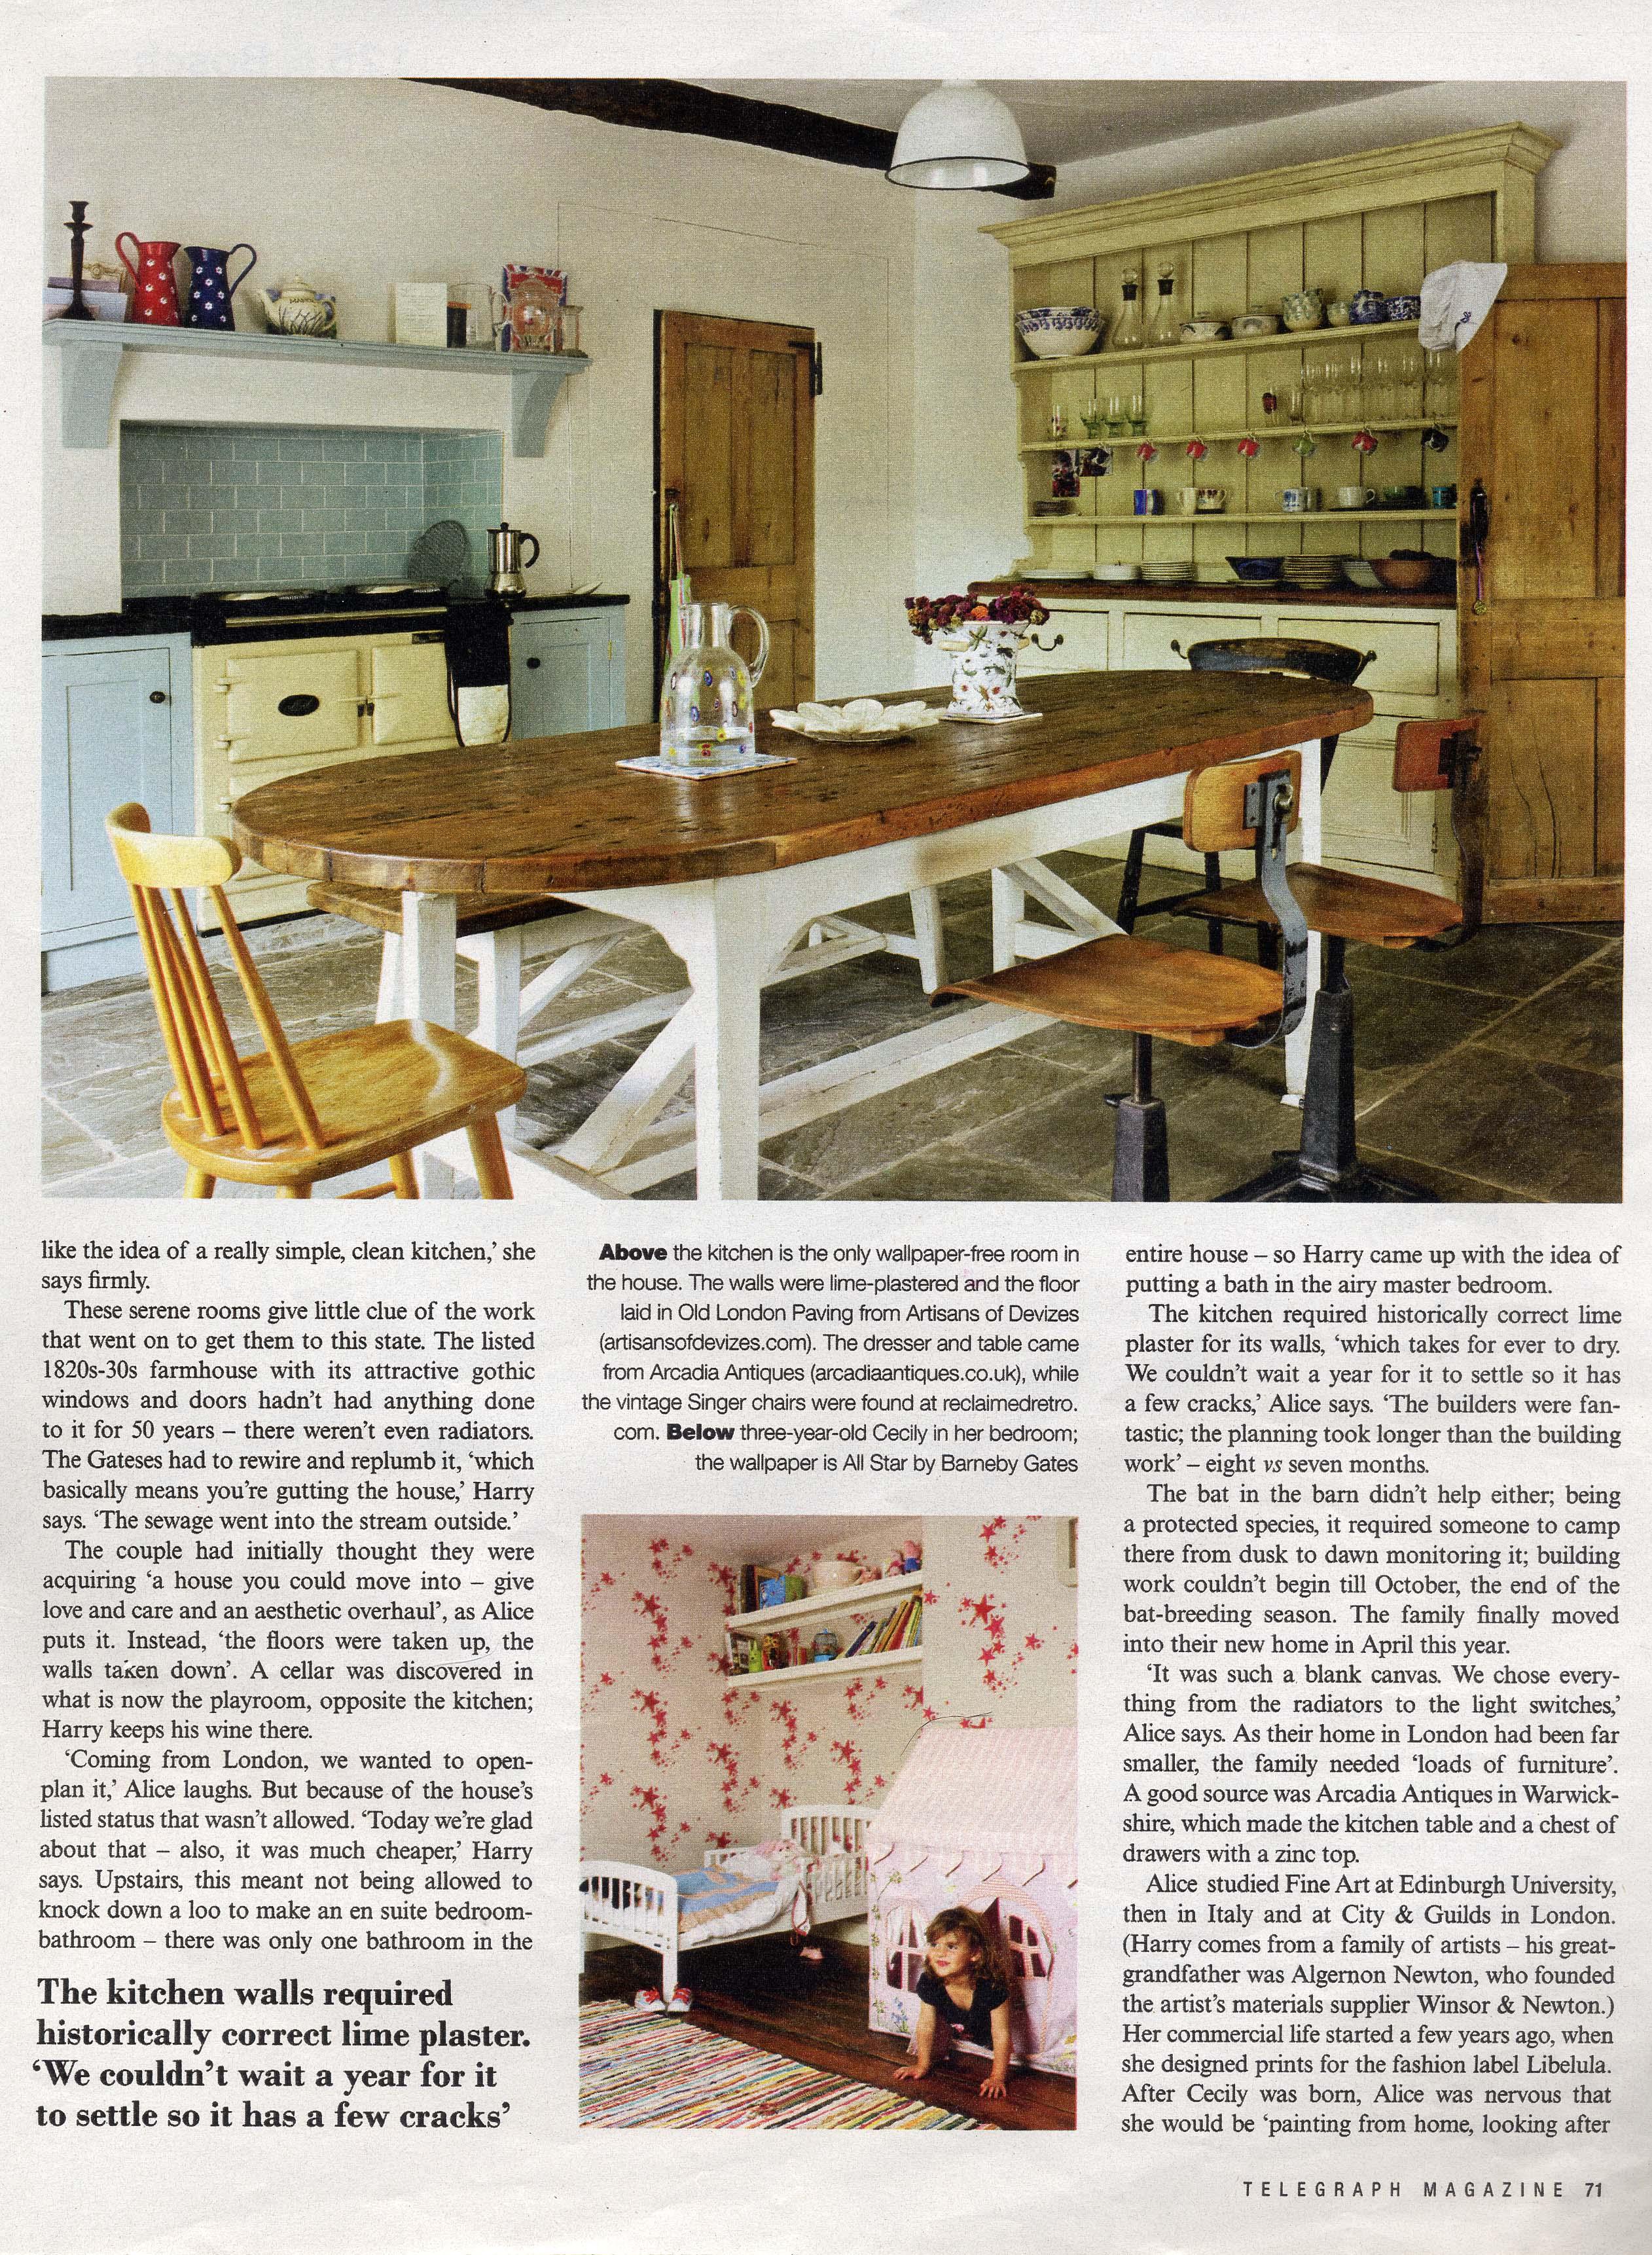 2011 Sept - Telegraph Magazine - page 4